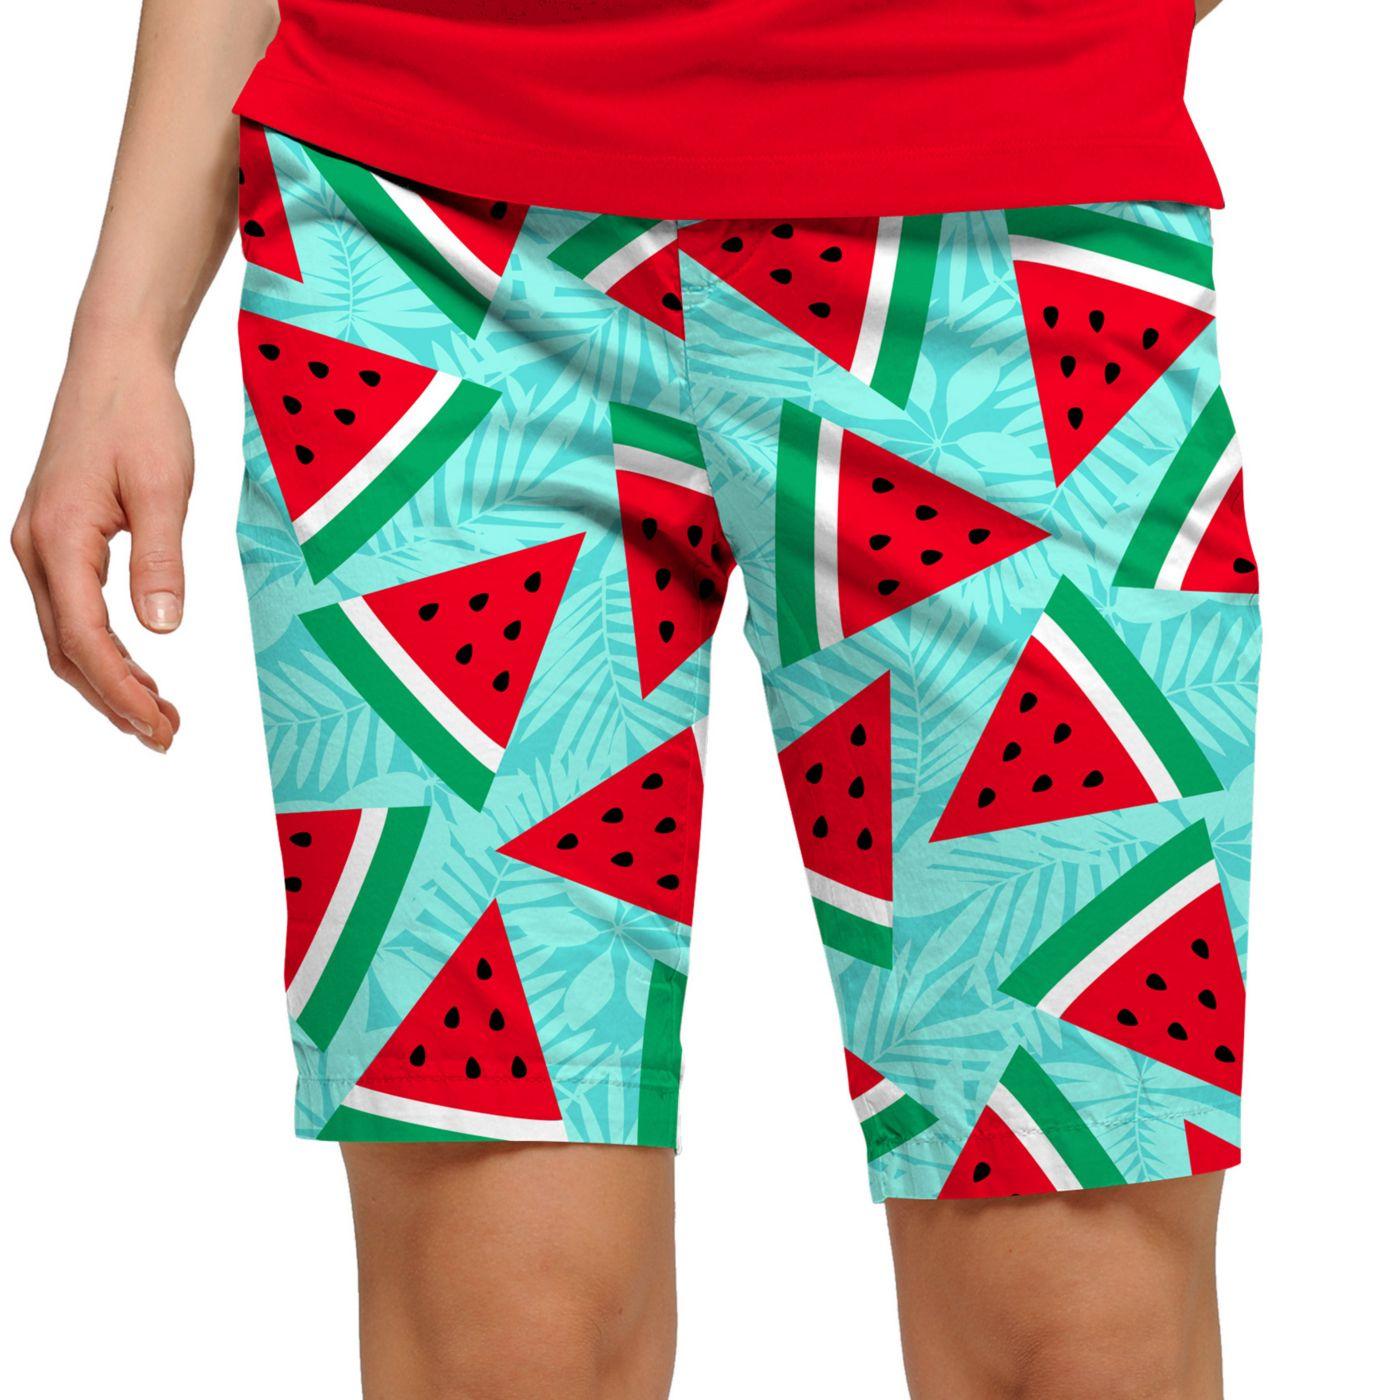 LoudMouth Women's Melons StretchTech Golf Bermuda Shorts